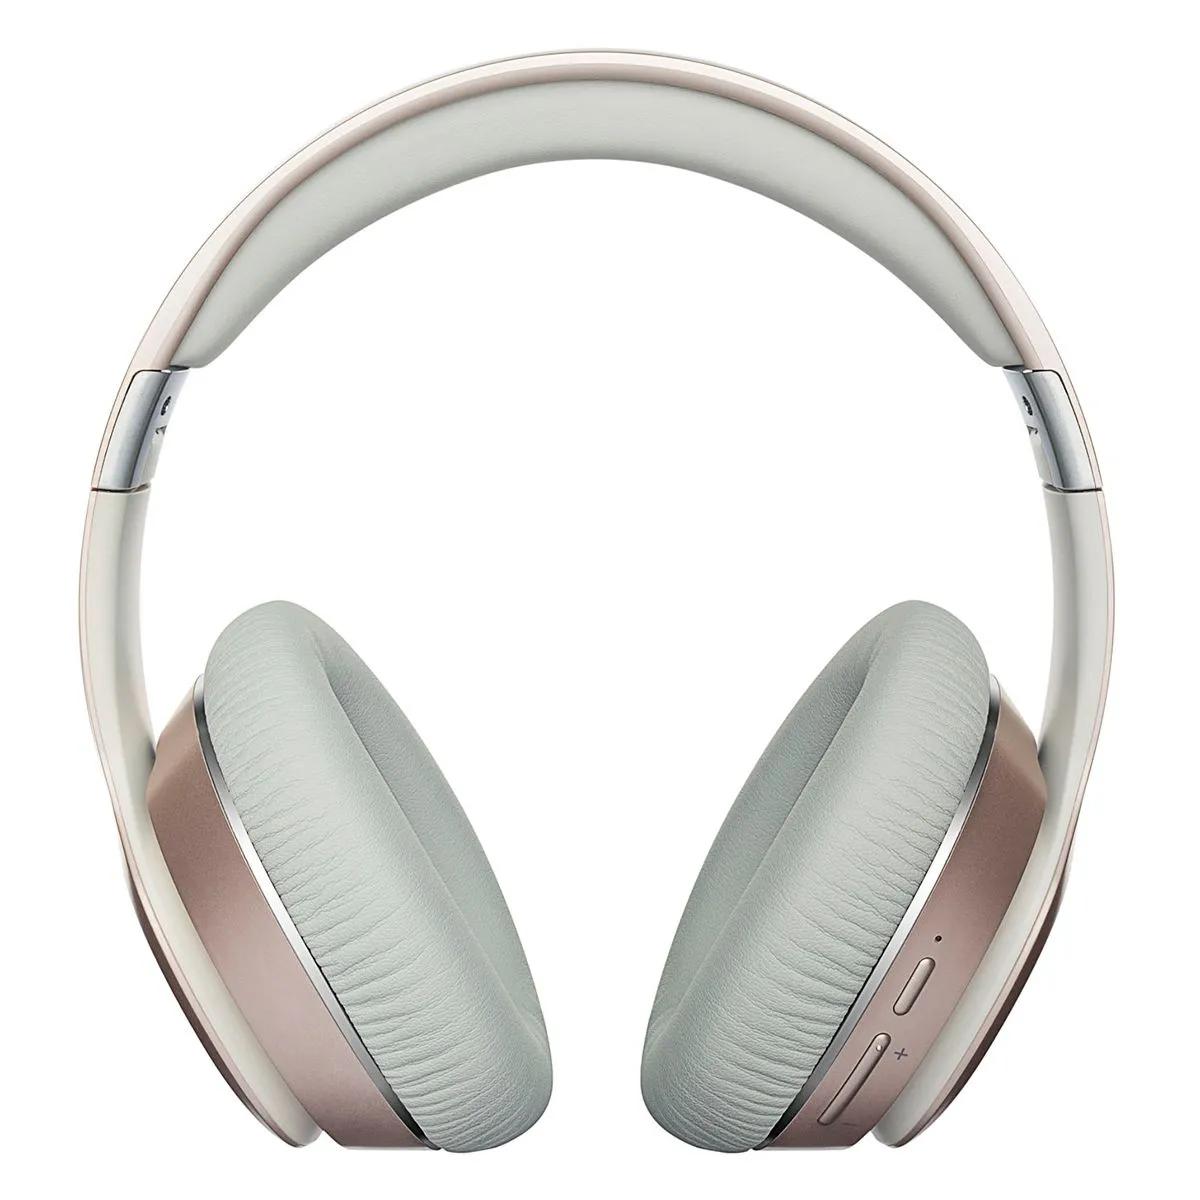 Fone de Ouvido Edifier W820BT Stereo Bluetooth Over Ear Dourado